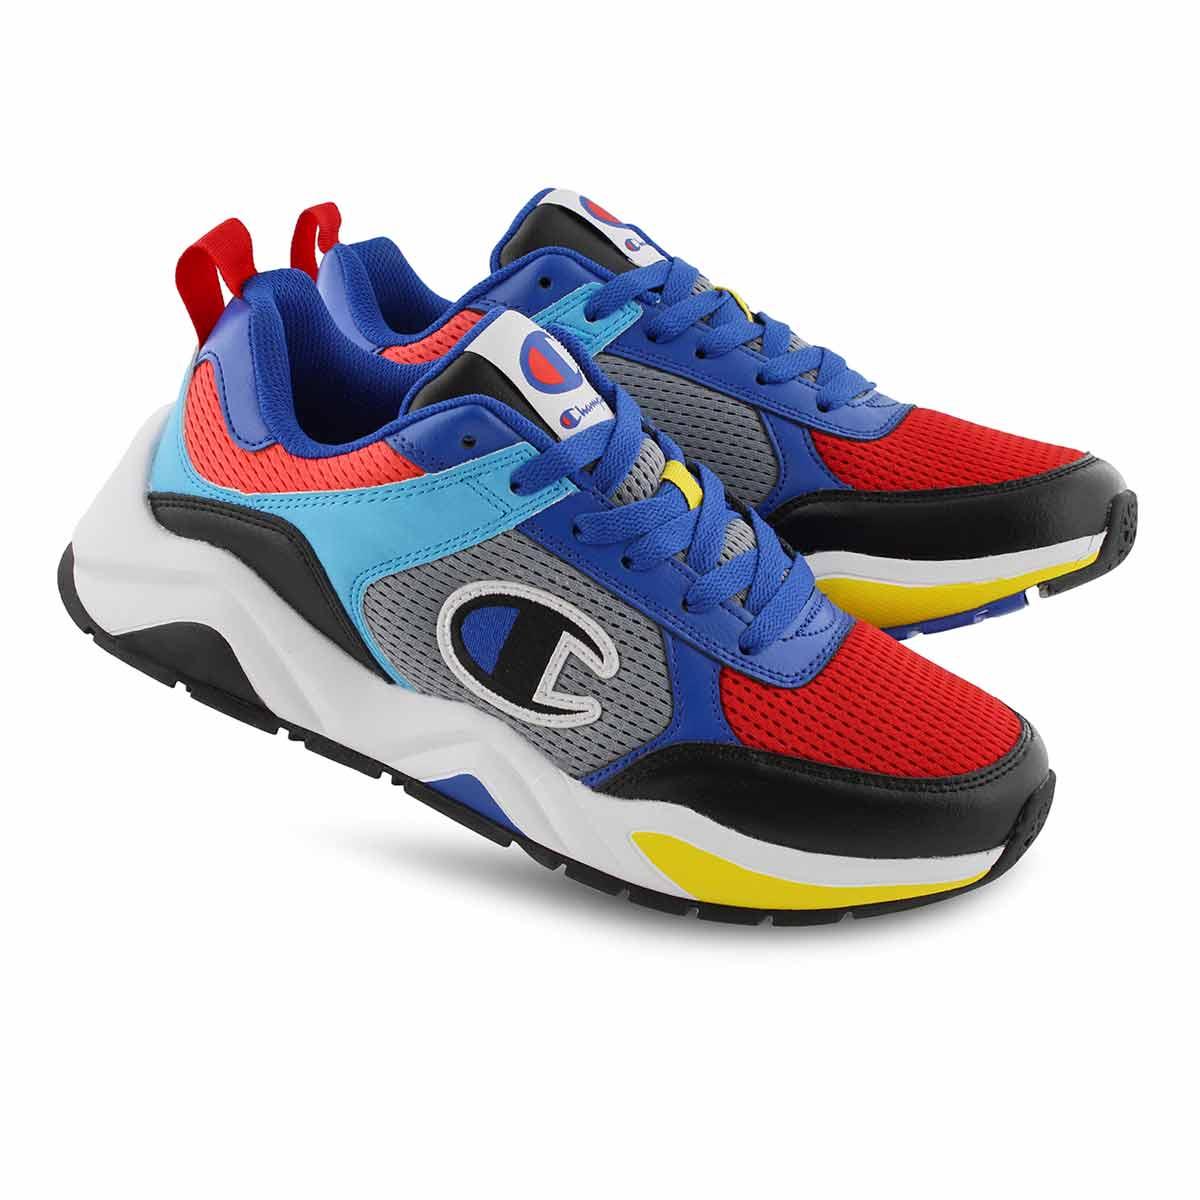 Mns 93Eighteen C Block blk mlti sneaker